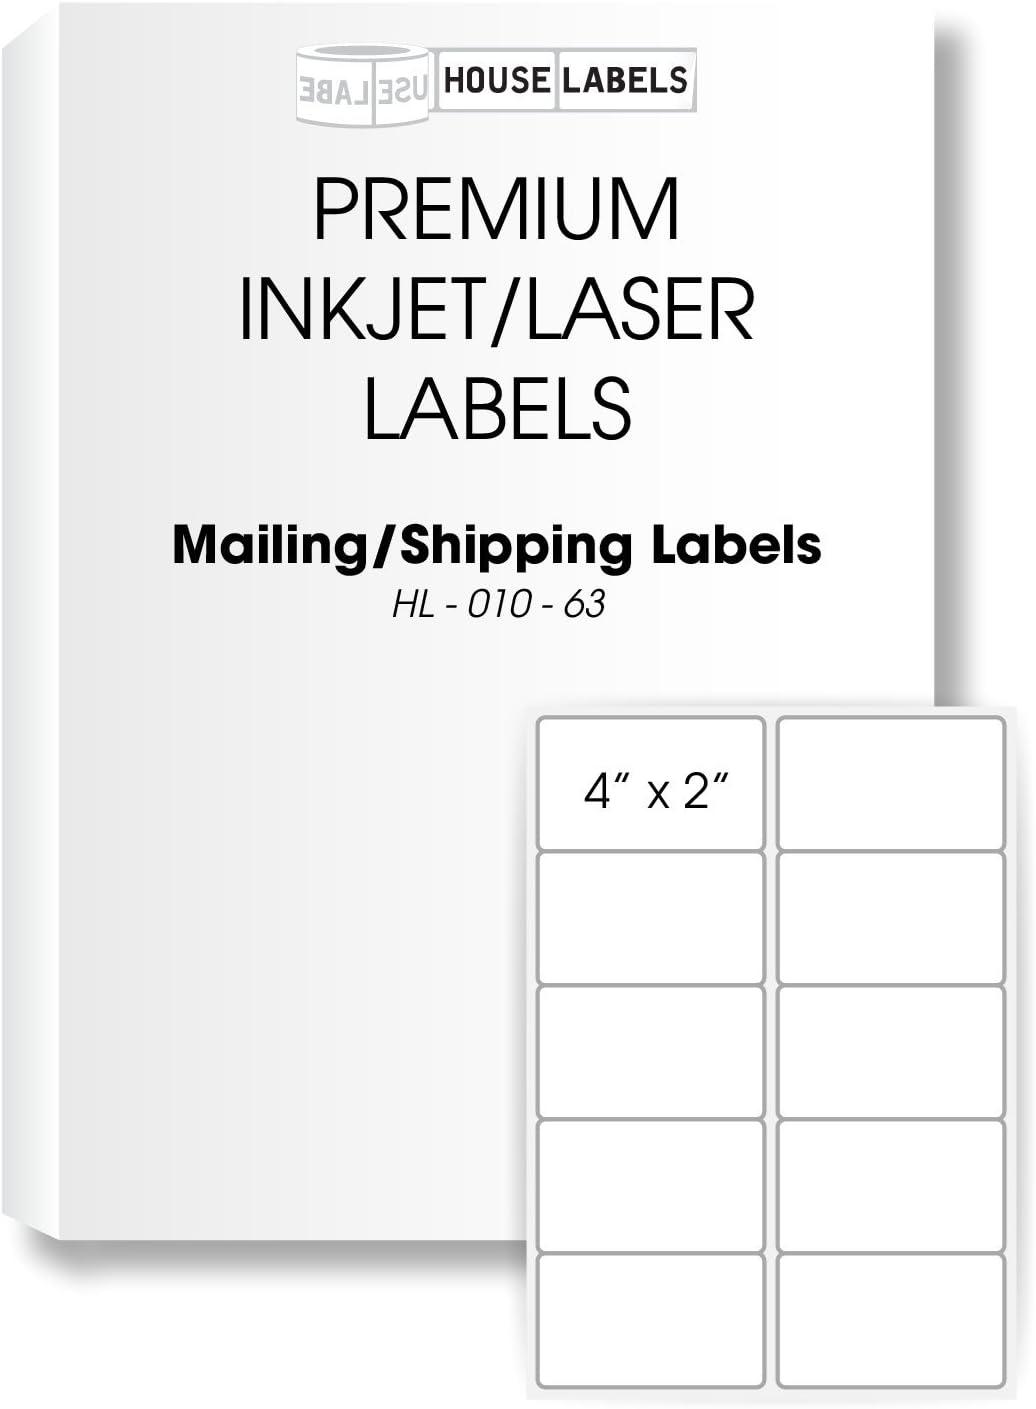 "400 Sheets; 4,000 Labels, 10-UP, Shipping Labels (4.0"" x 2.0"") - BPA Free!"